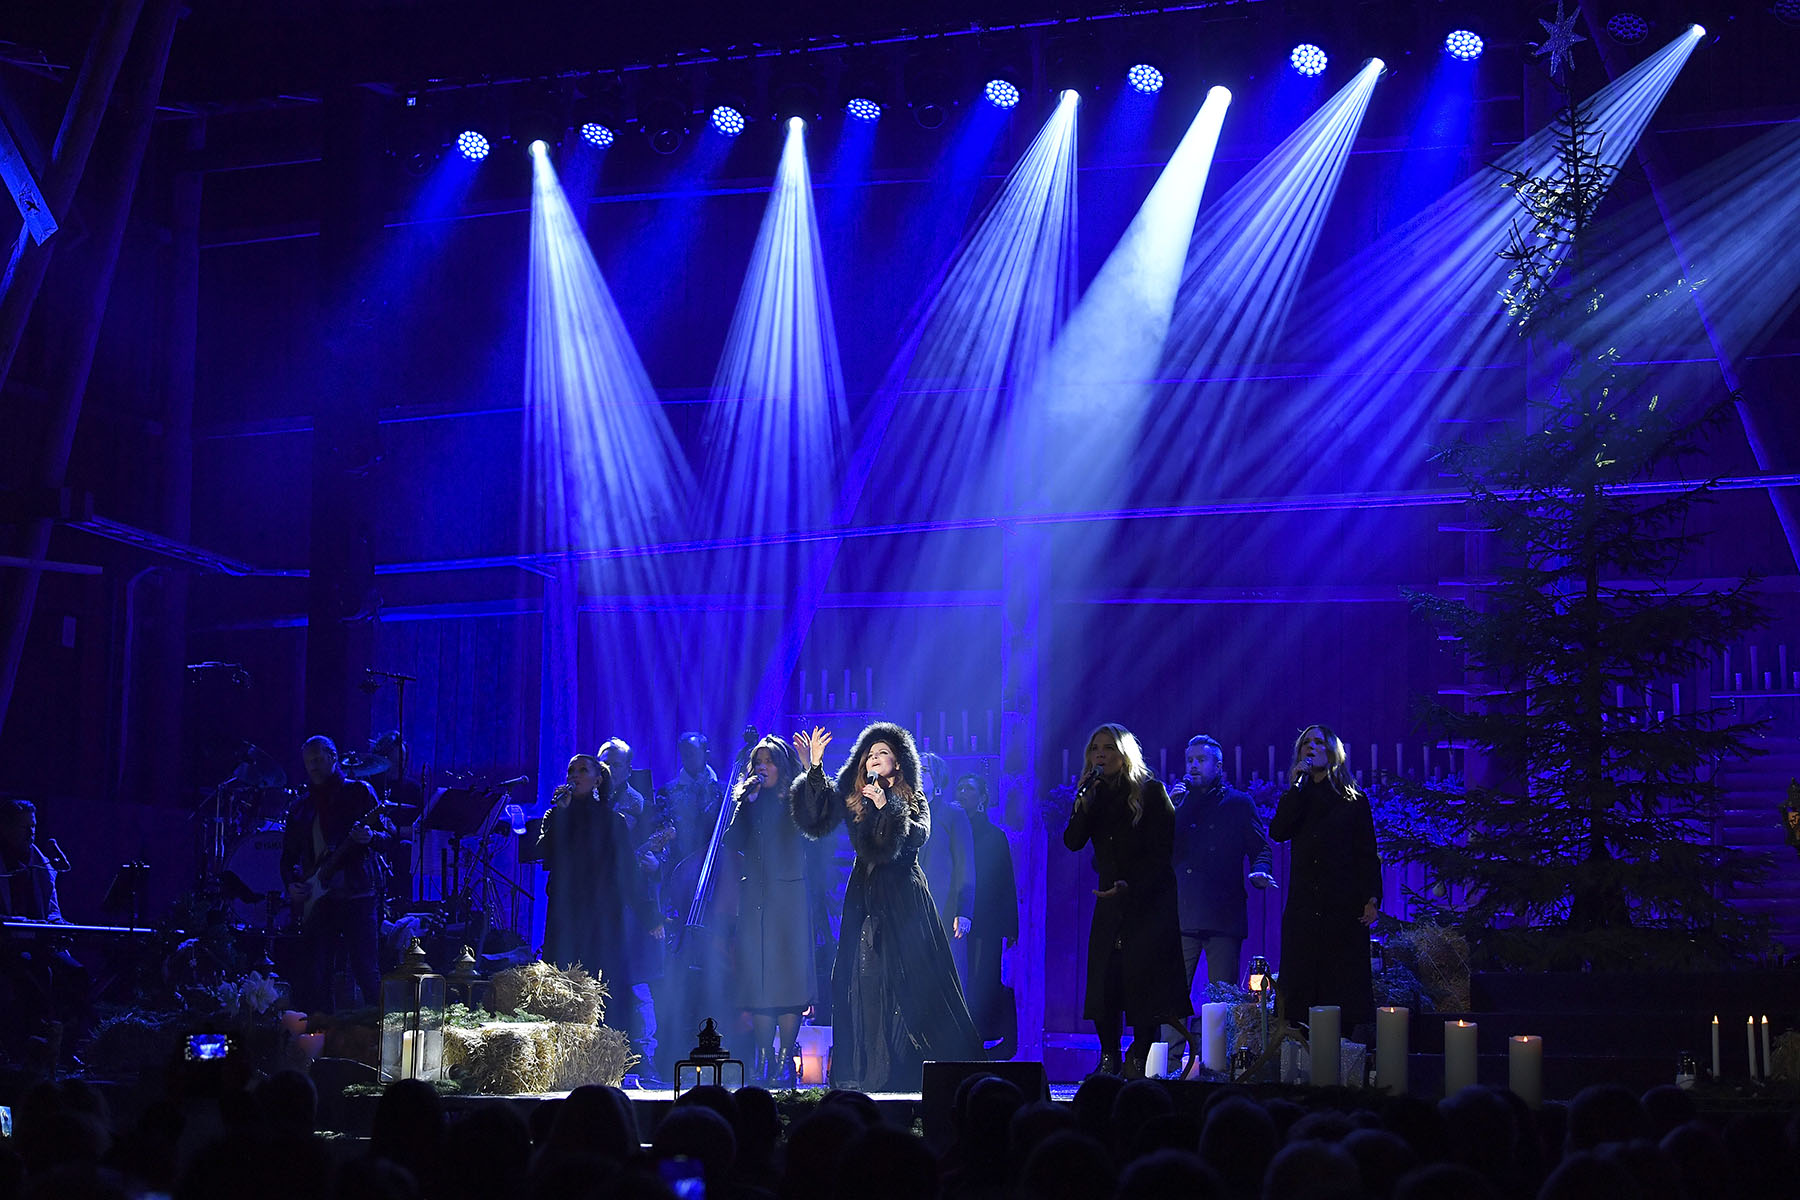 Robe Carola concerts _KT18612.jpg